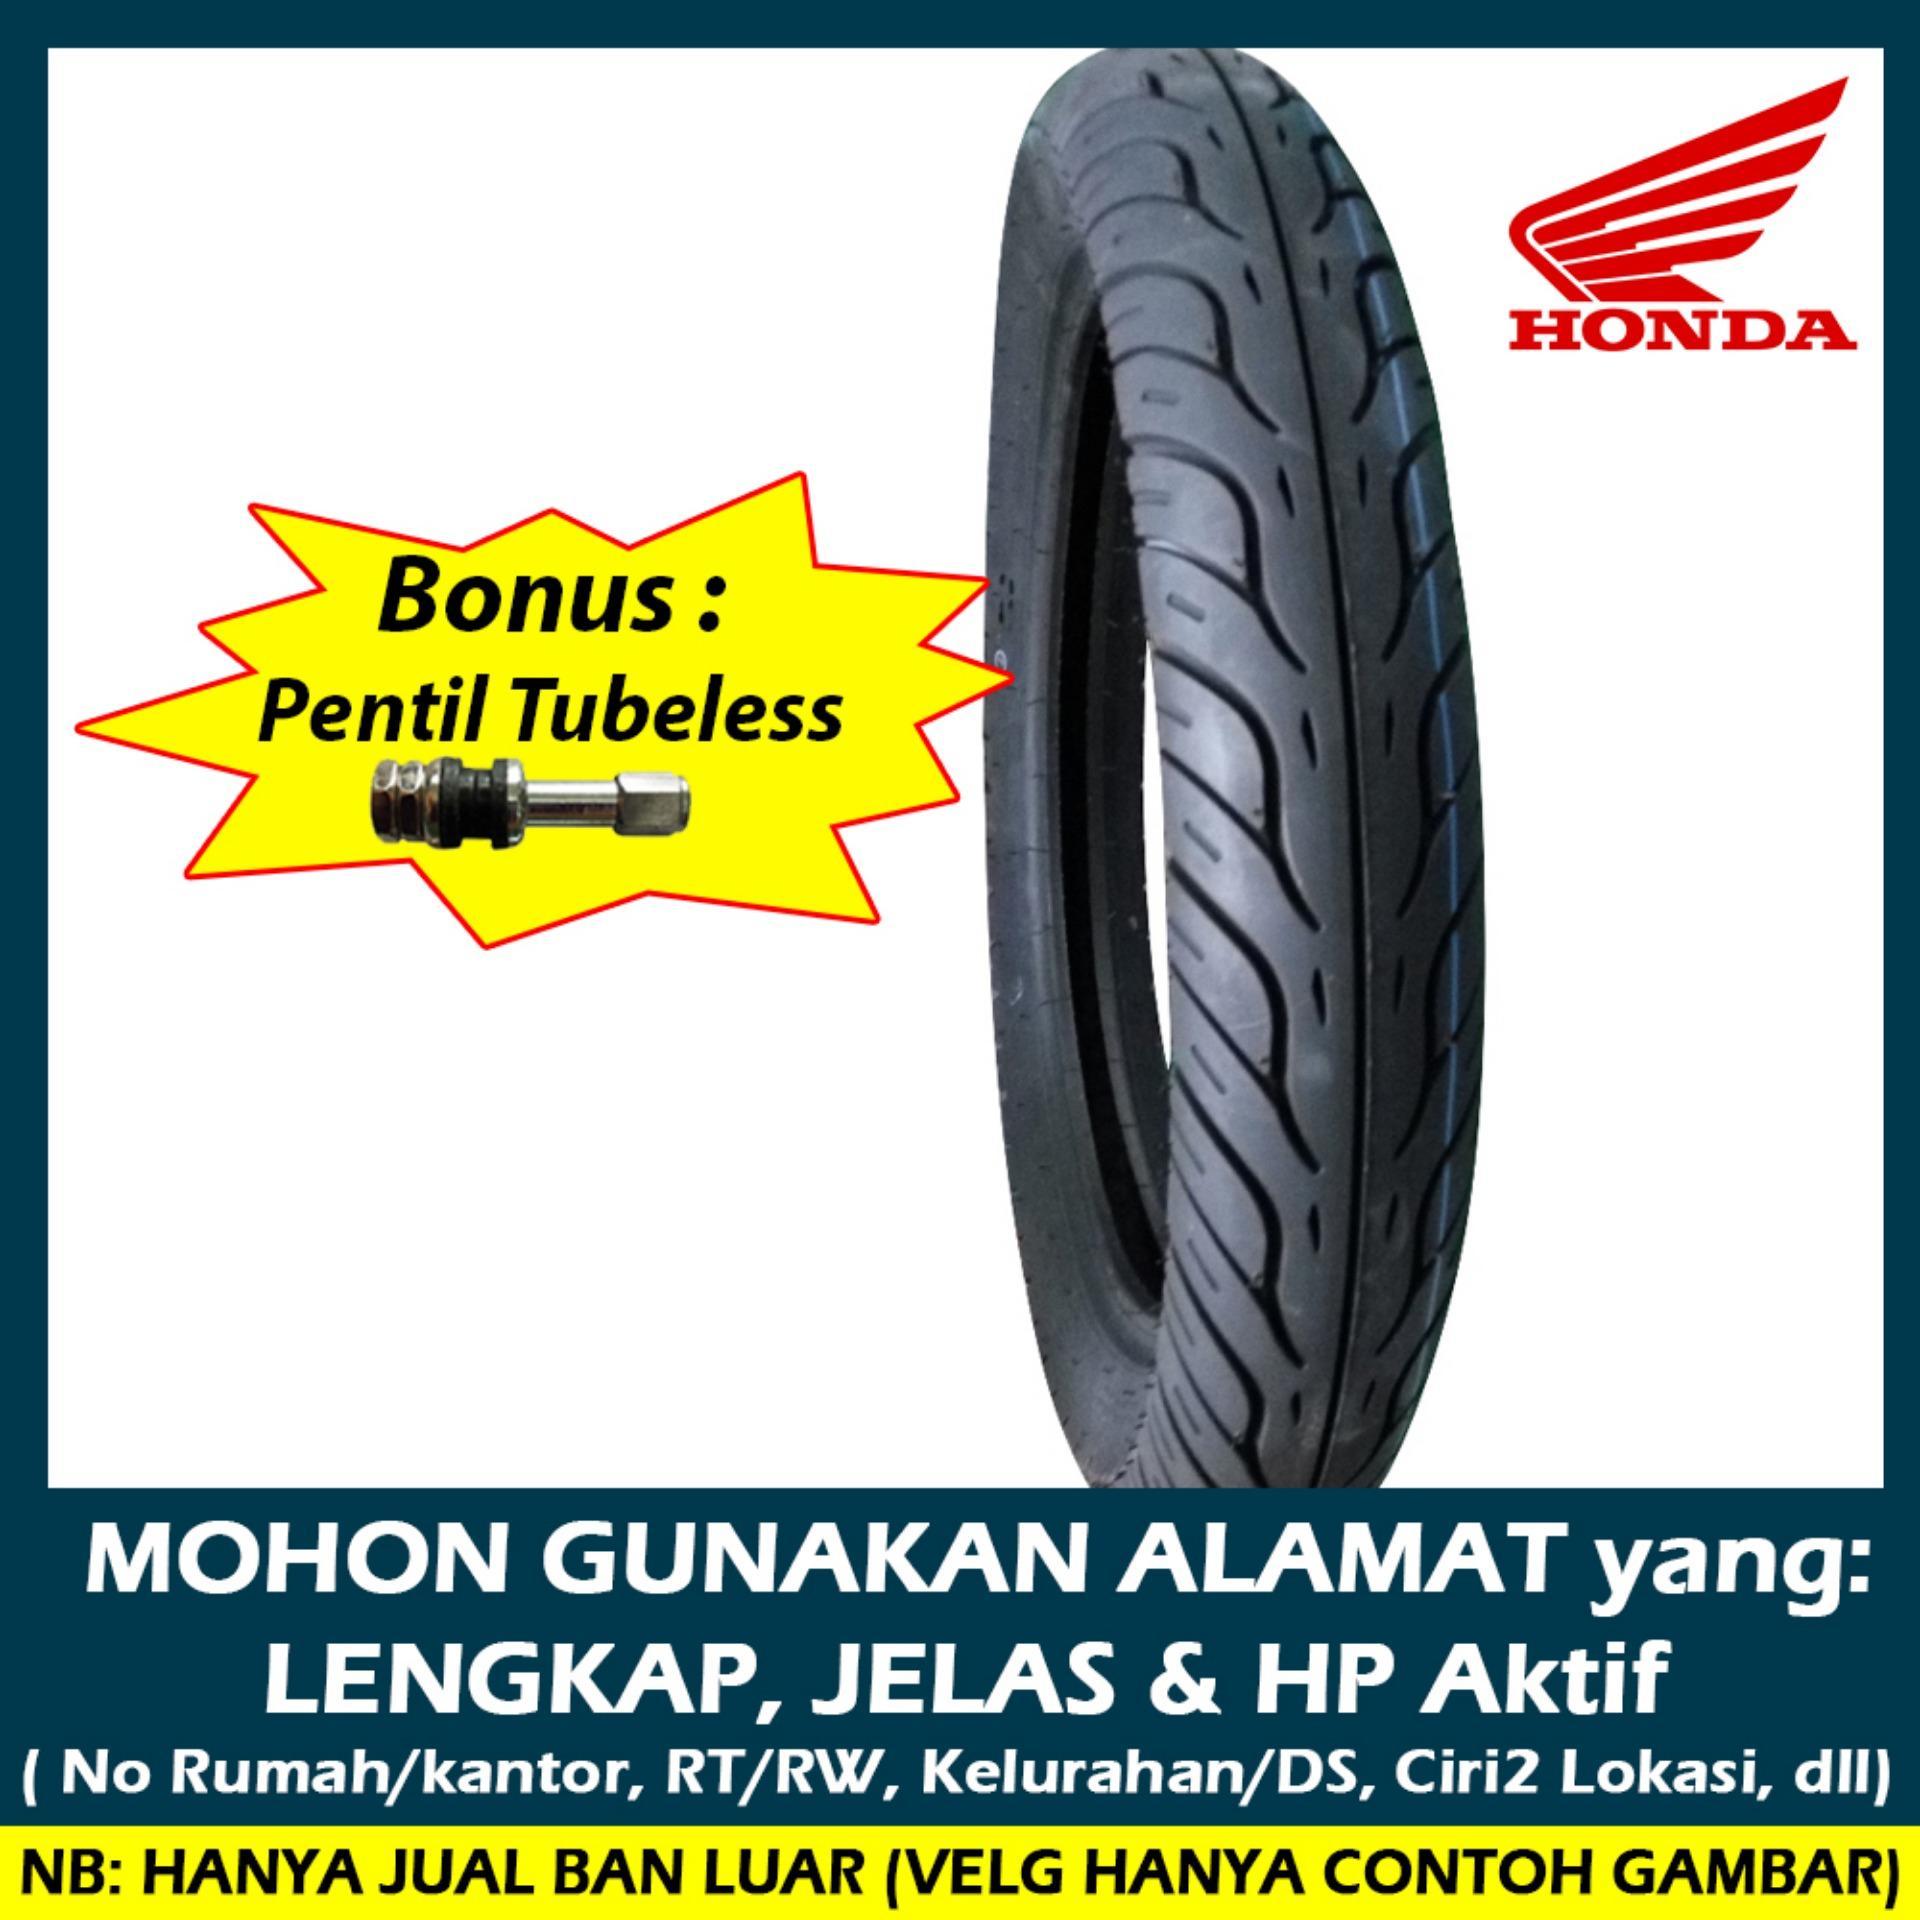 Buy Sell Cheapest Pentil Ban Velg Best Quality Product Deals Tutup Hijau Nitrogen Segi 6 Ahm K59 80 90 14 Tubeless Resmi Matic Honda Free